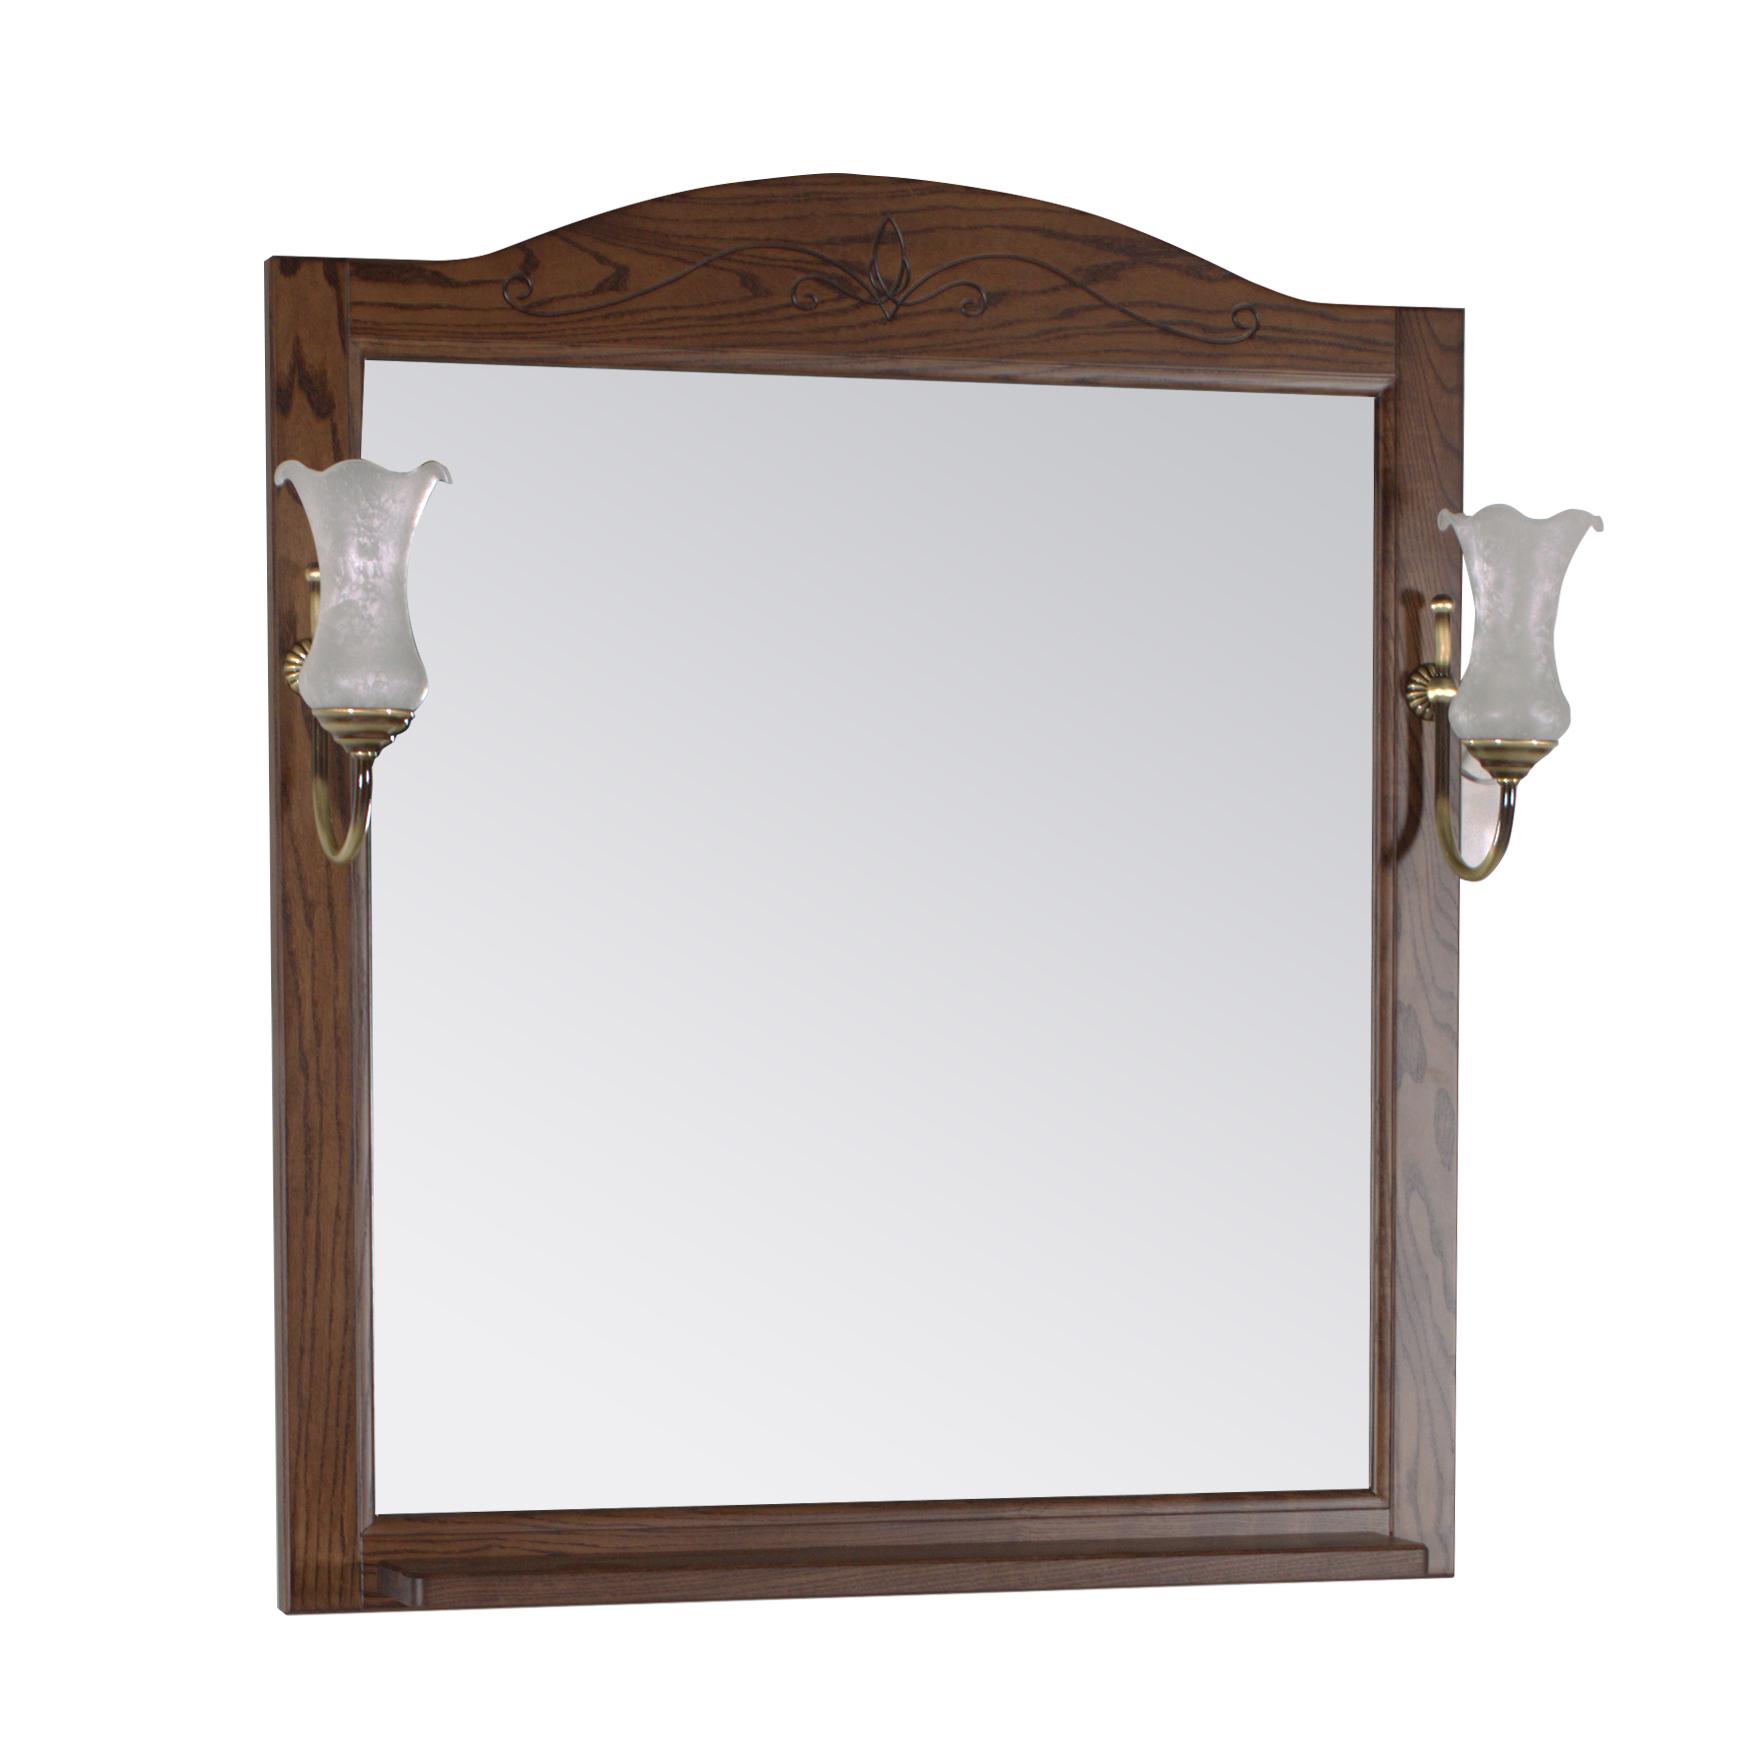 Зеркало АСБ мебель Салерно 80 Woodline антикварный орех цена